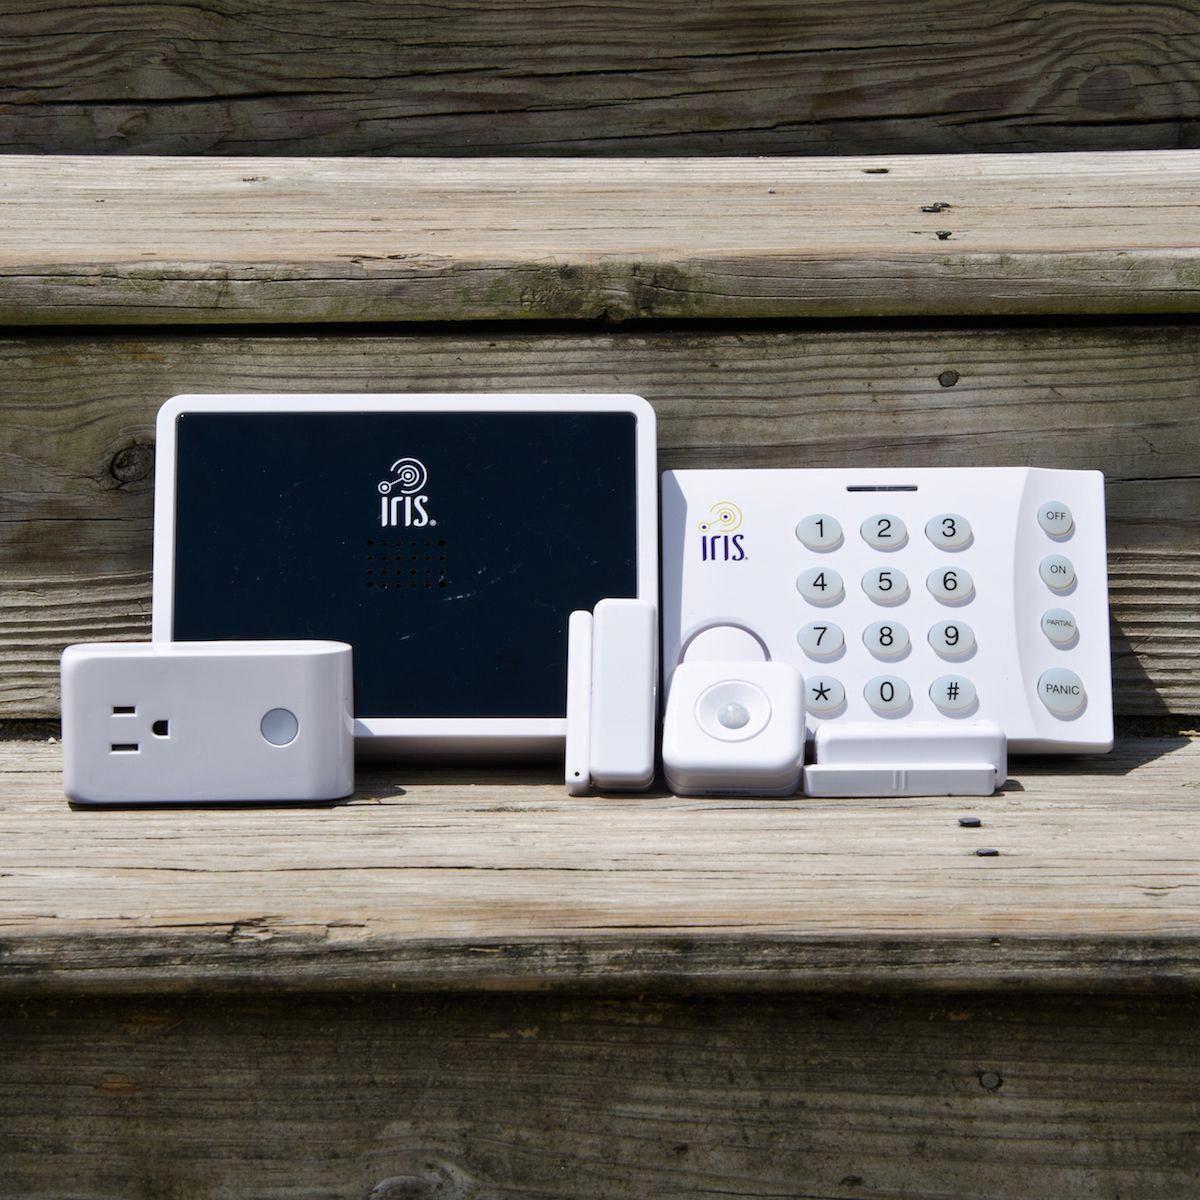 Best Diy Home Security Systems Of 2021 Reviews Com Home Security Systems Diy Home Security Wireless Home Security Systems